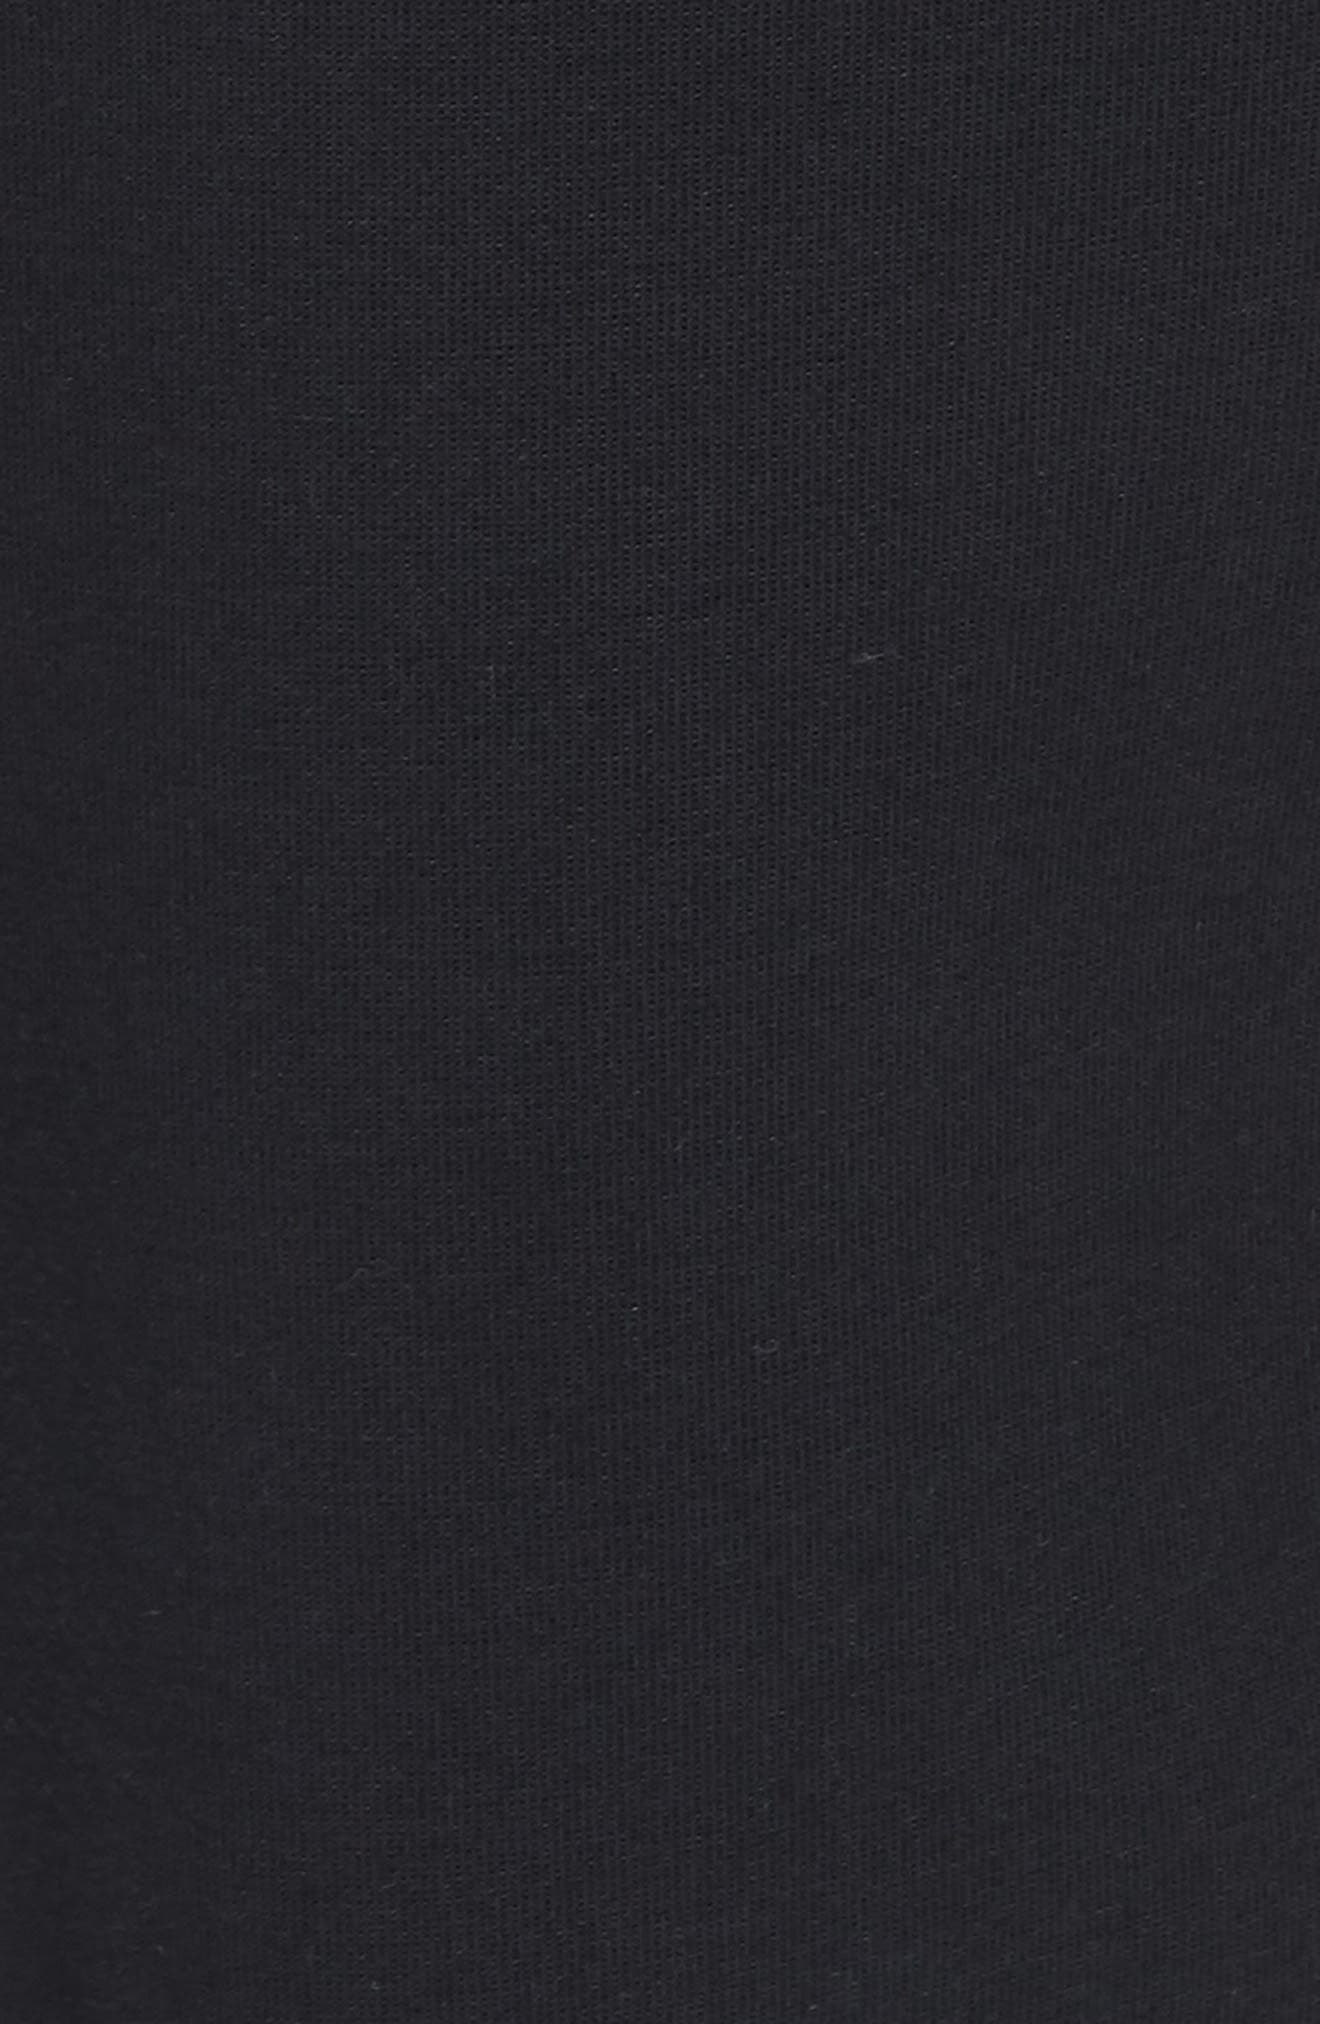 Sportswear High Rise Tech Fleece Jogger Pants,                             Alternate thumbnail 6, color,                             BLACK/ BLACK/ WHITE